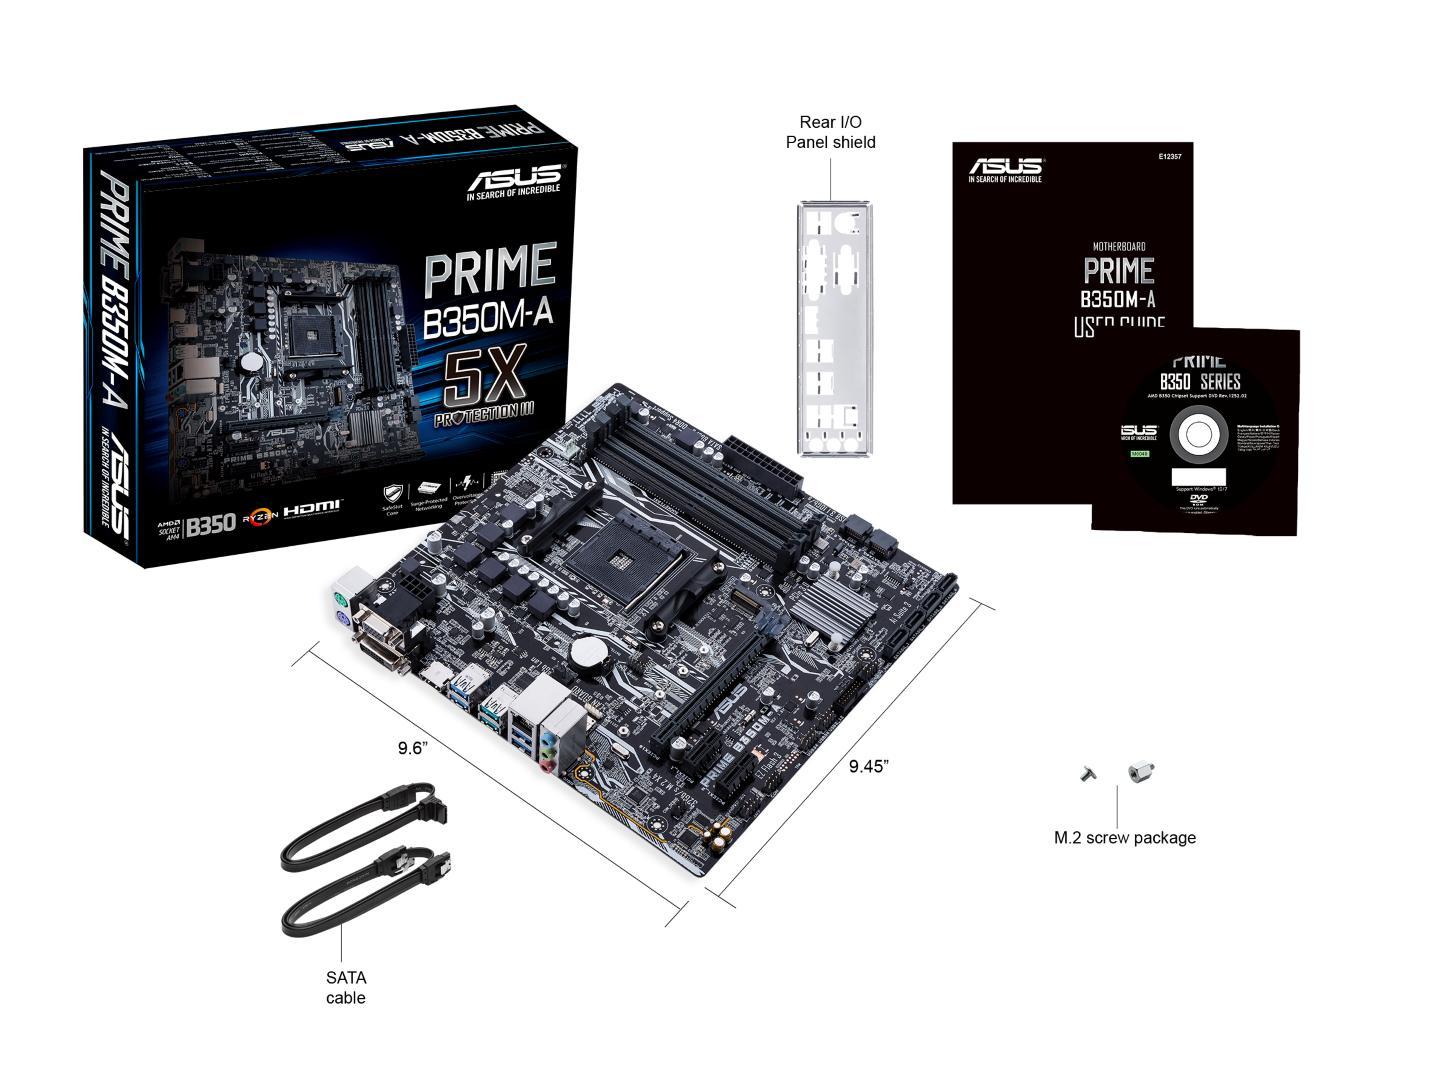 Asus PRIME B350M-A Micro ATX AM4